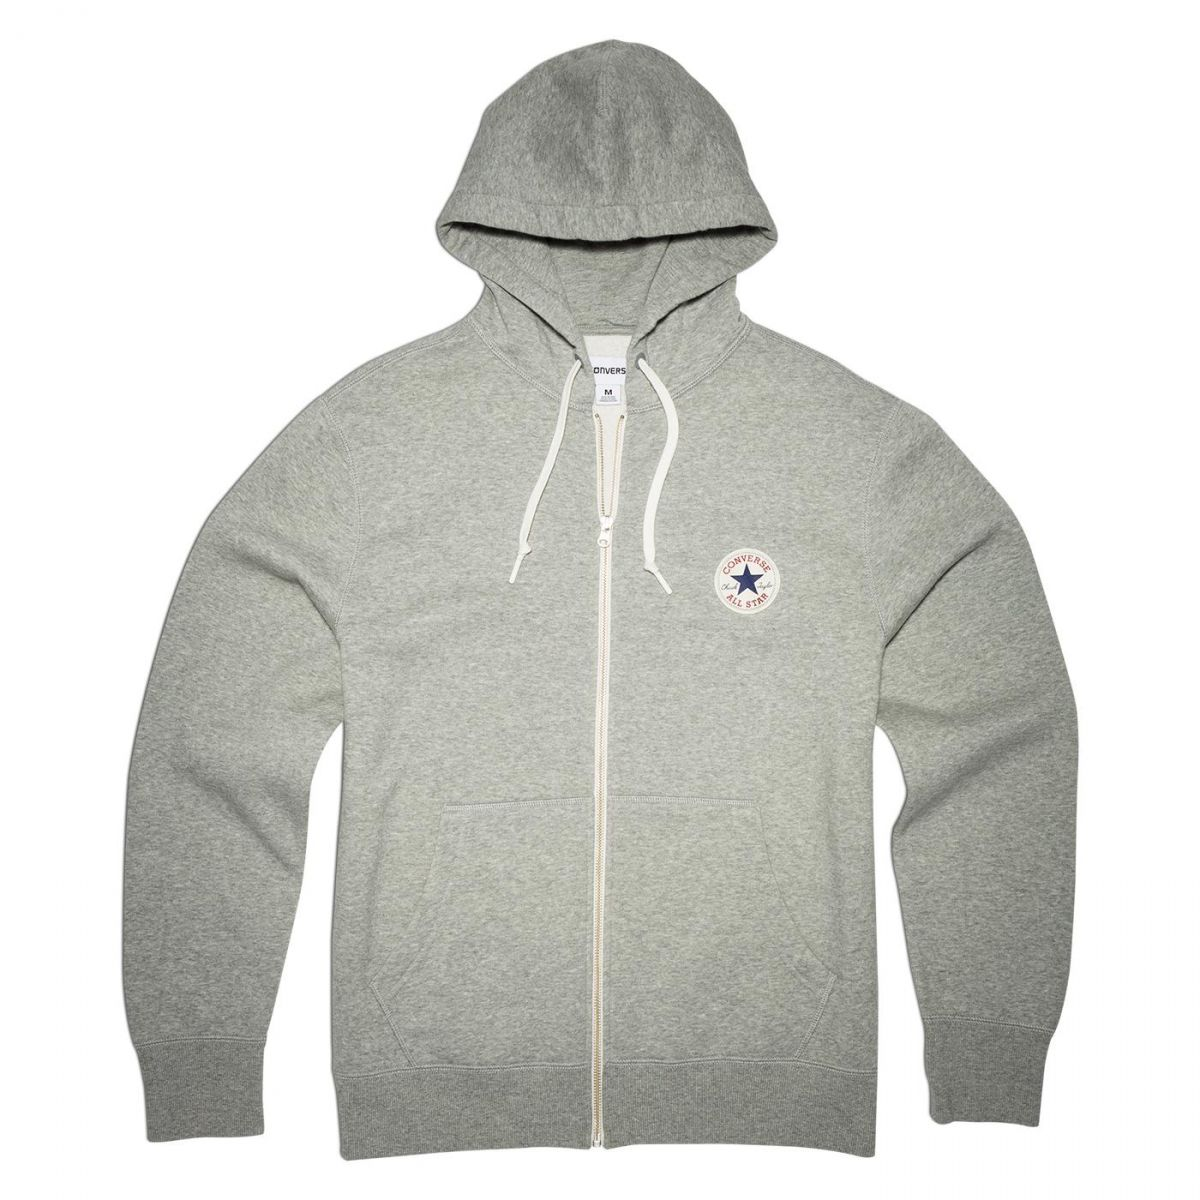 converse core full zip hoodie herren kapuzenjacke grau 10002131 a01 sport klingenmaier. Black Bedroom Furniture Sets. Home Design Ideas